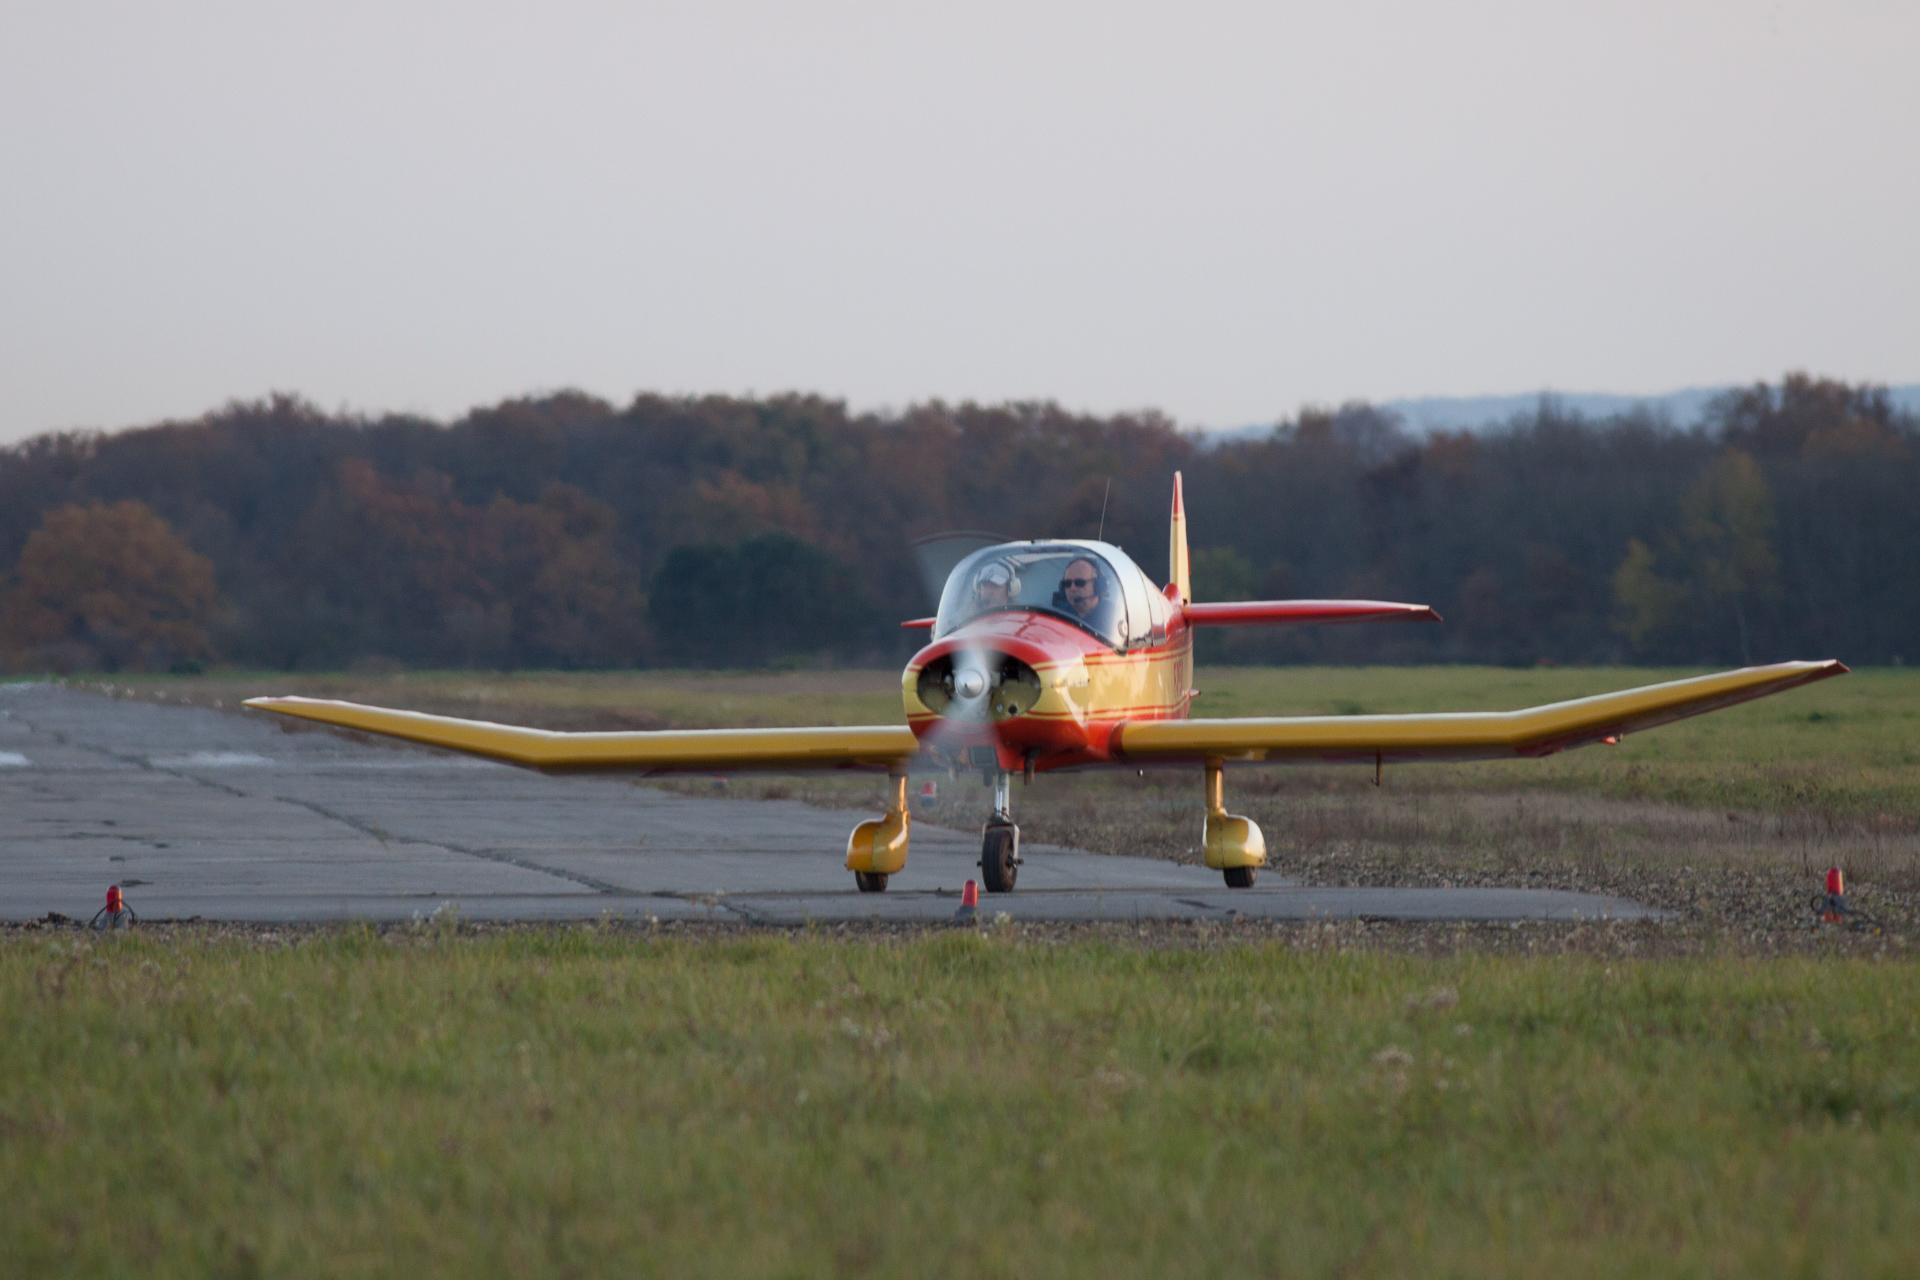 2015-11-15 16-59-47 Aeroclub-6